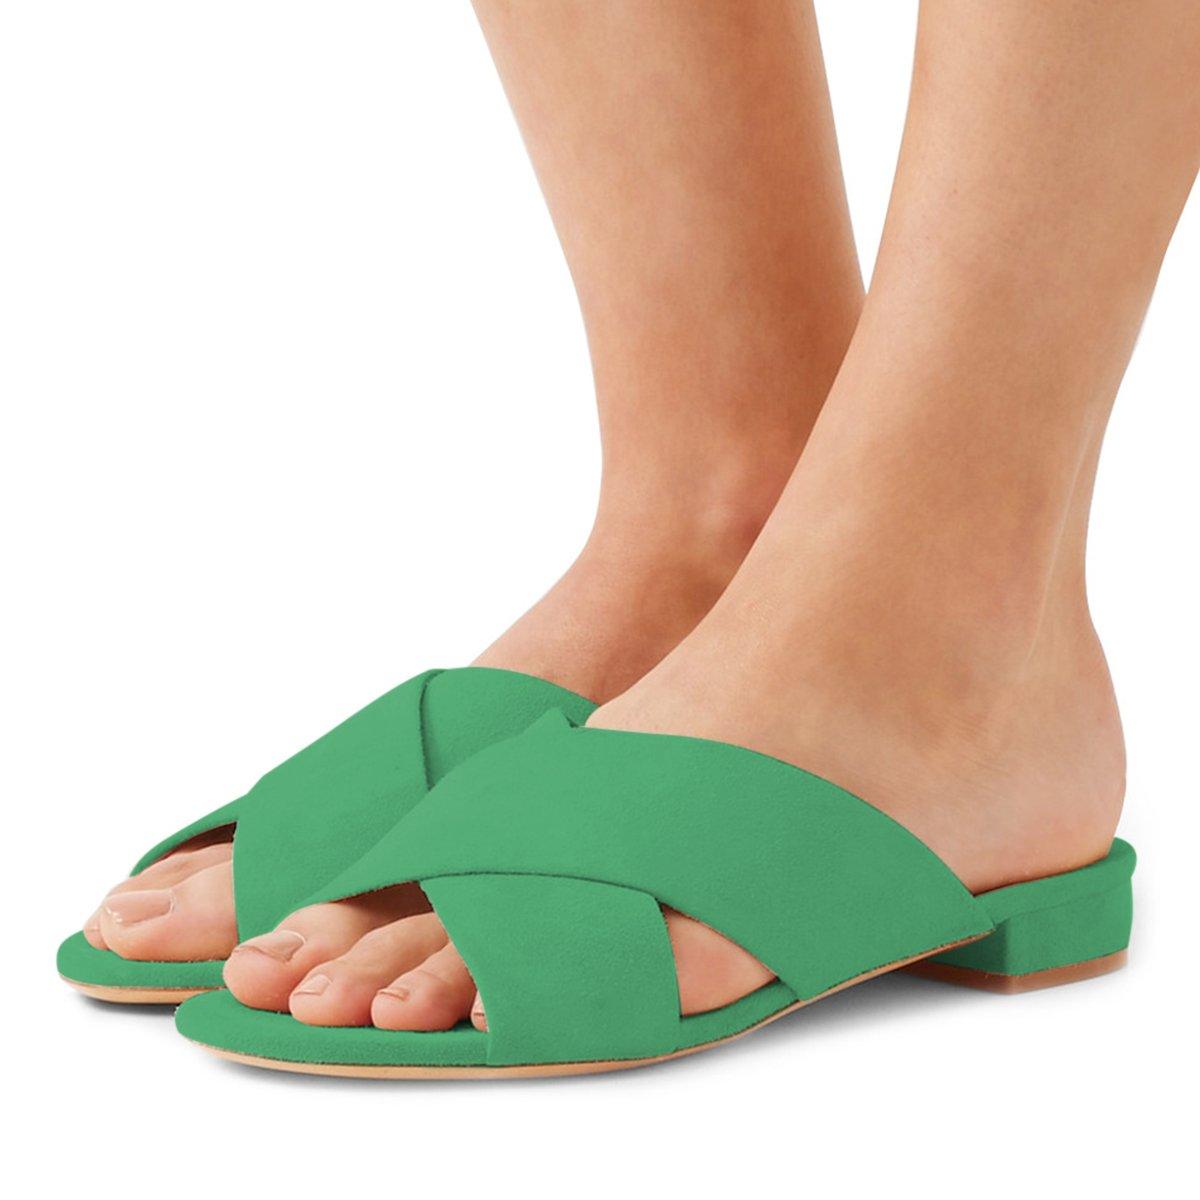 FSJ Women Comfortable Cross Strap Sandals Low Heels Mules Slide Casual Flats Shoes Size 4-15 US B07CTF9GLT 8 B(M) US|Green